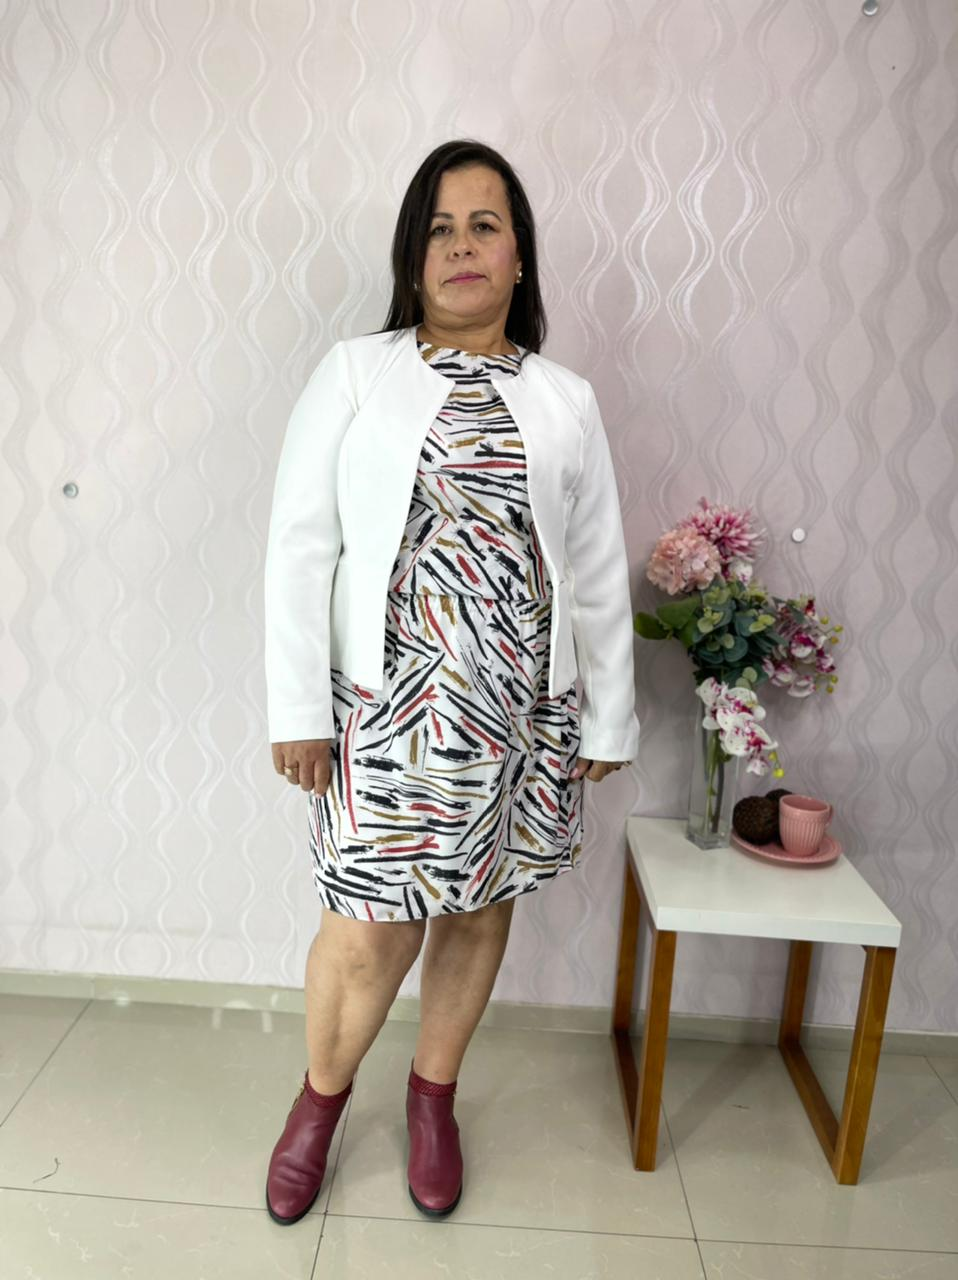 CASACO CECYTHA MODAS MANUELLA OFF-WHITE MODA EVANGÉLICA